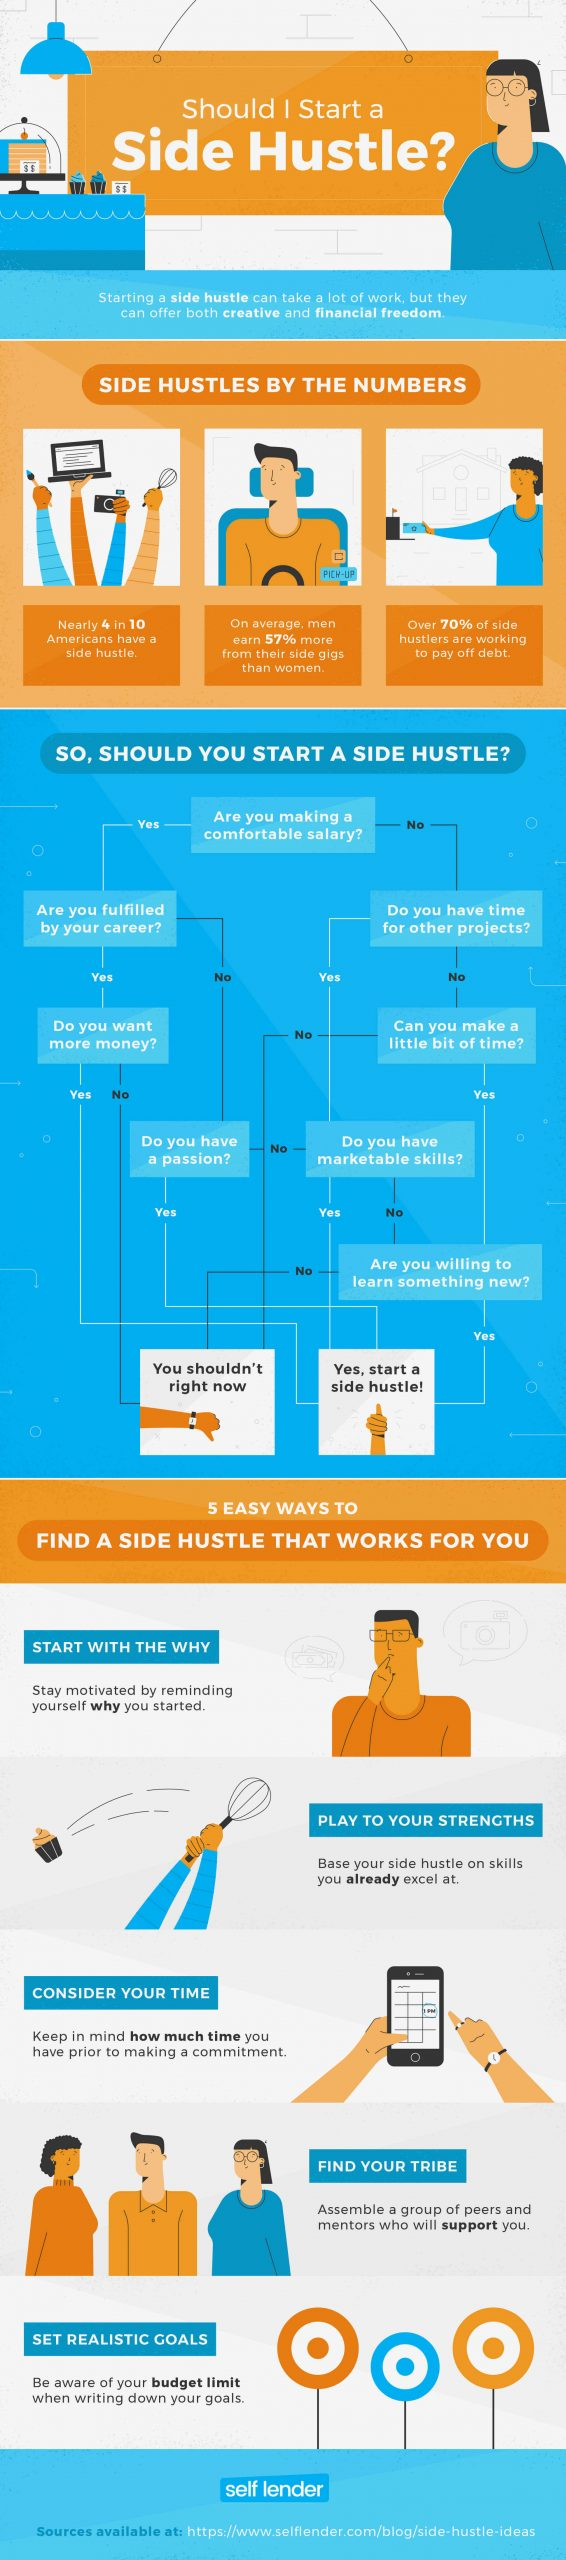 Start A Side Hustle Infographic compressed